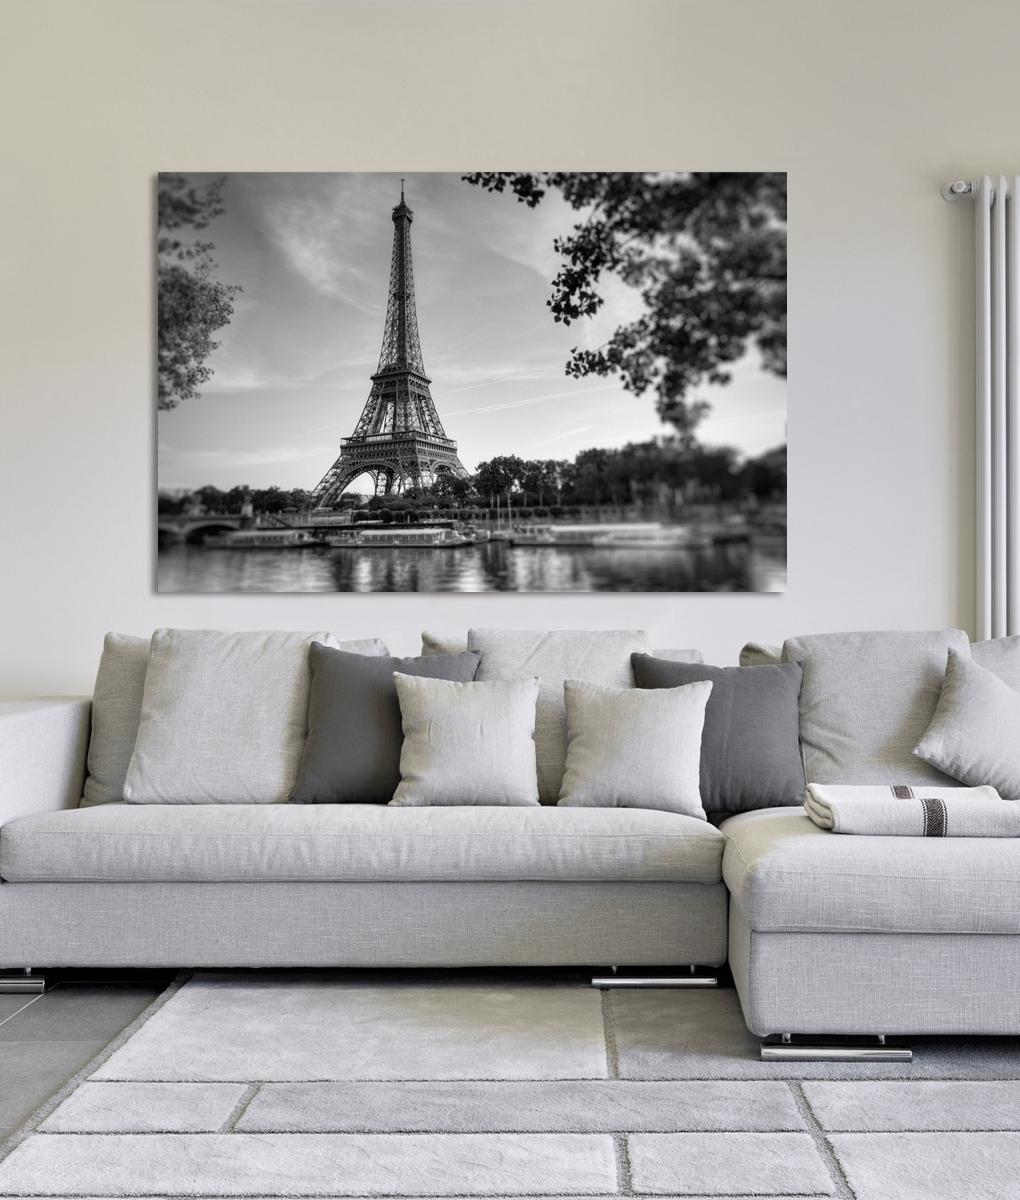 Canvas Wall Art Of Paris Regarding Newest Paris Siene River Eiffel Tower Canvas Print (View 3 of 15)